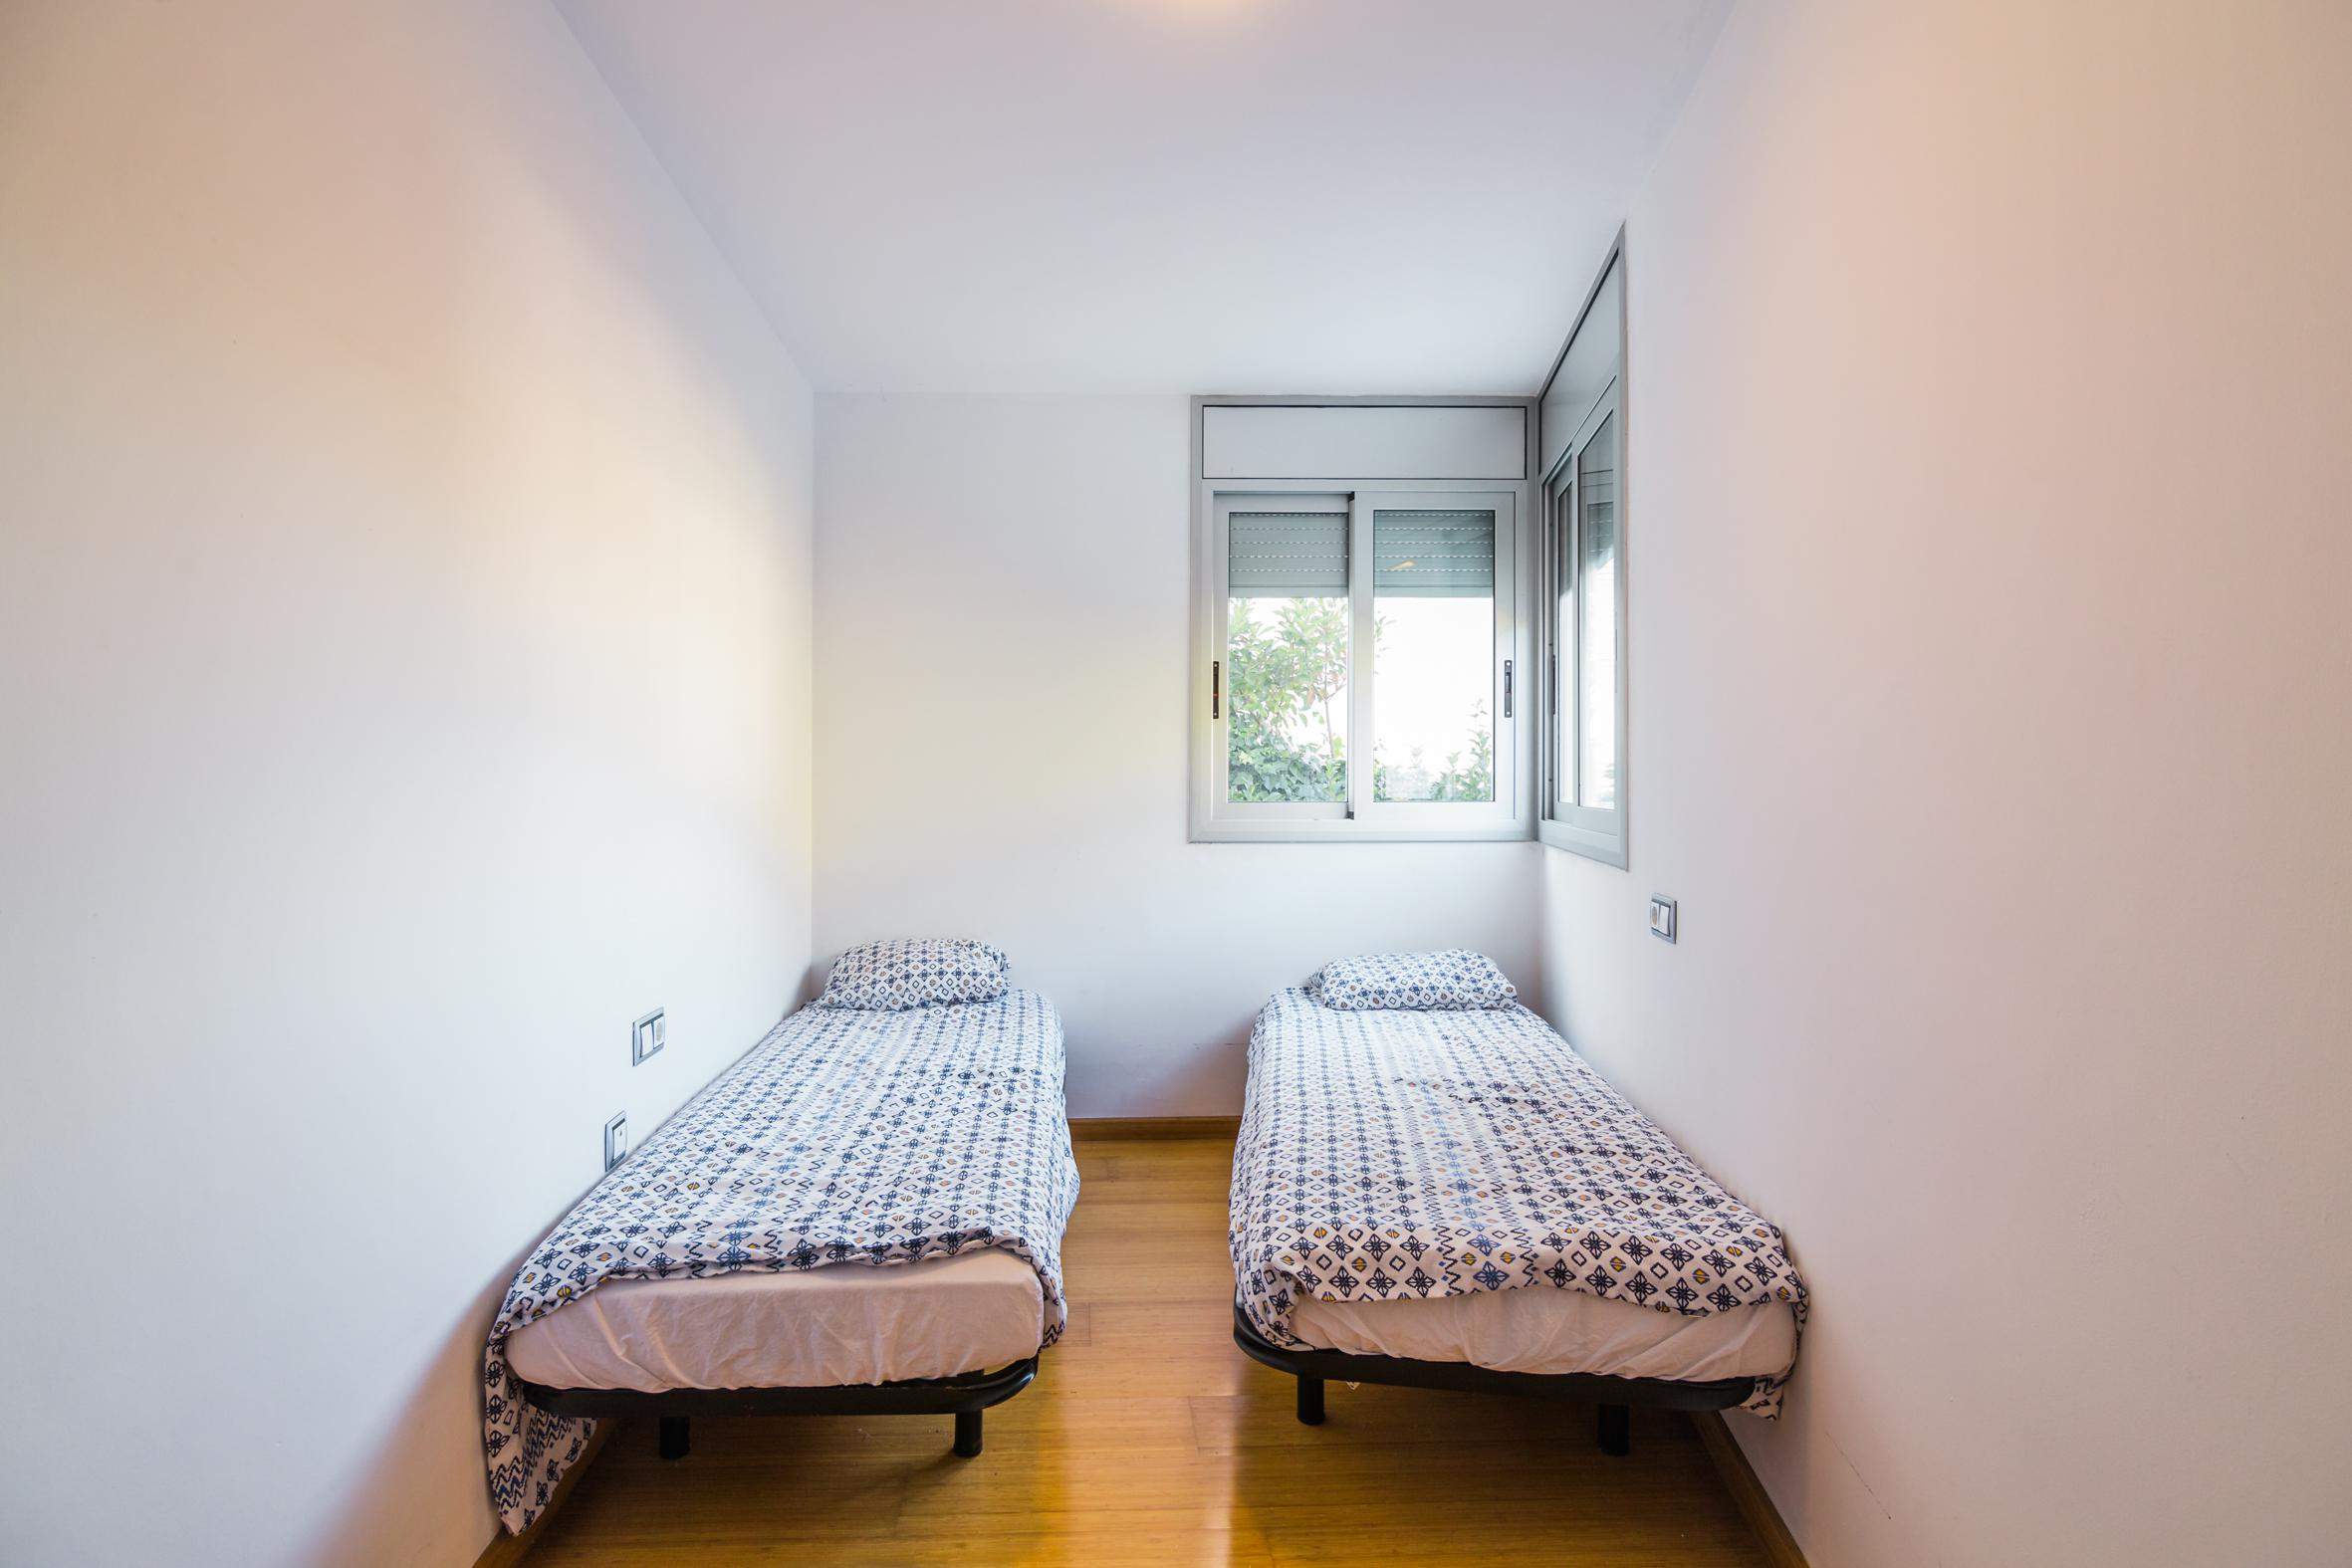 191467 Casa en venta en Centre Llevantina-Montgavina 17